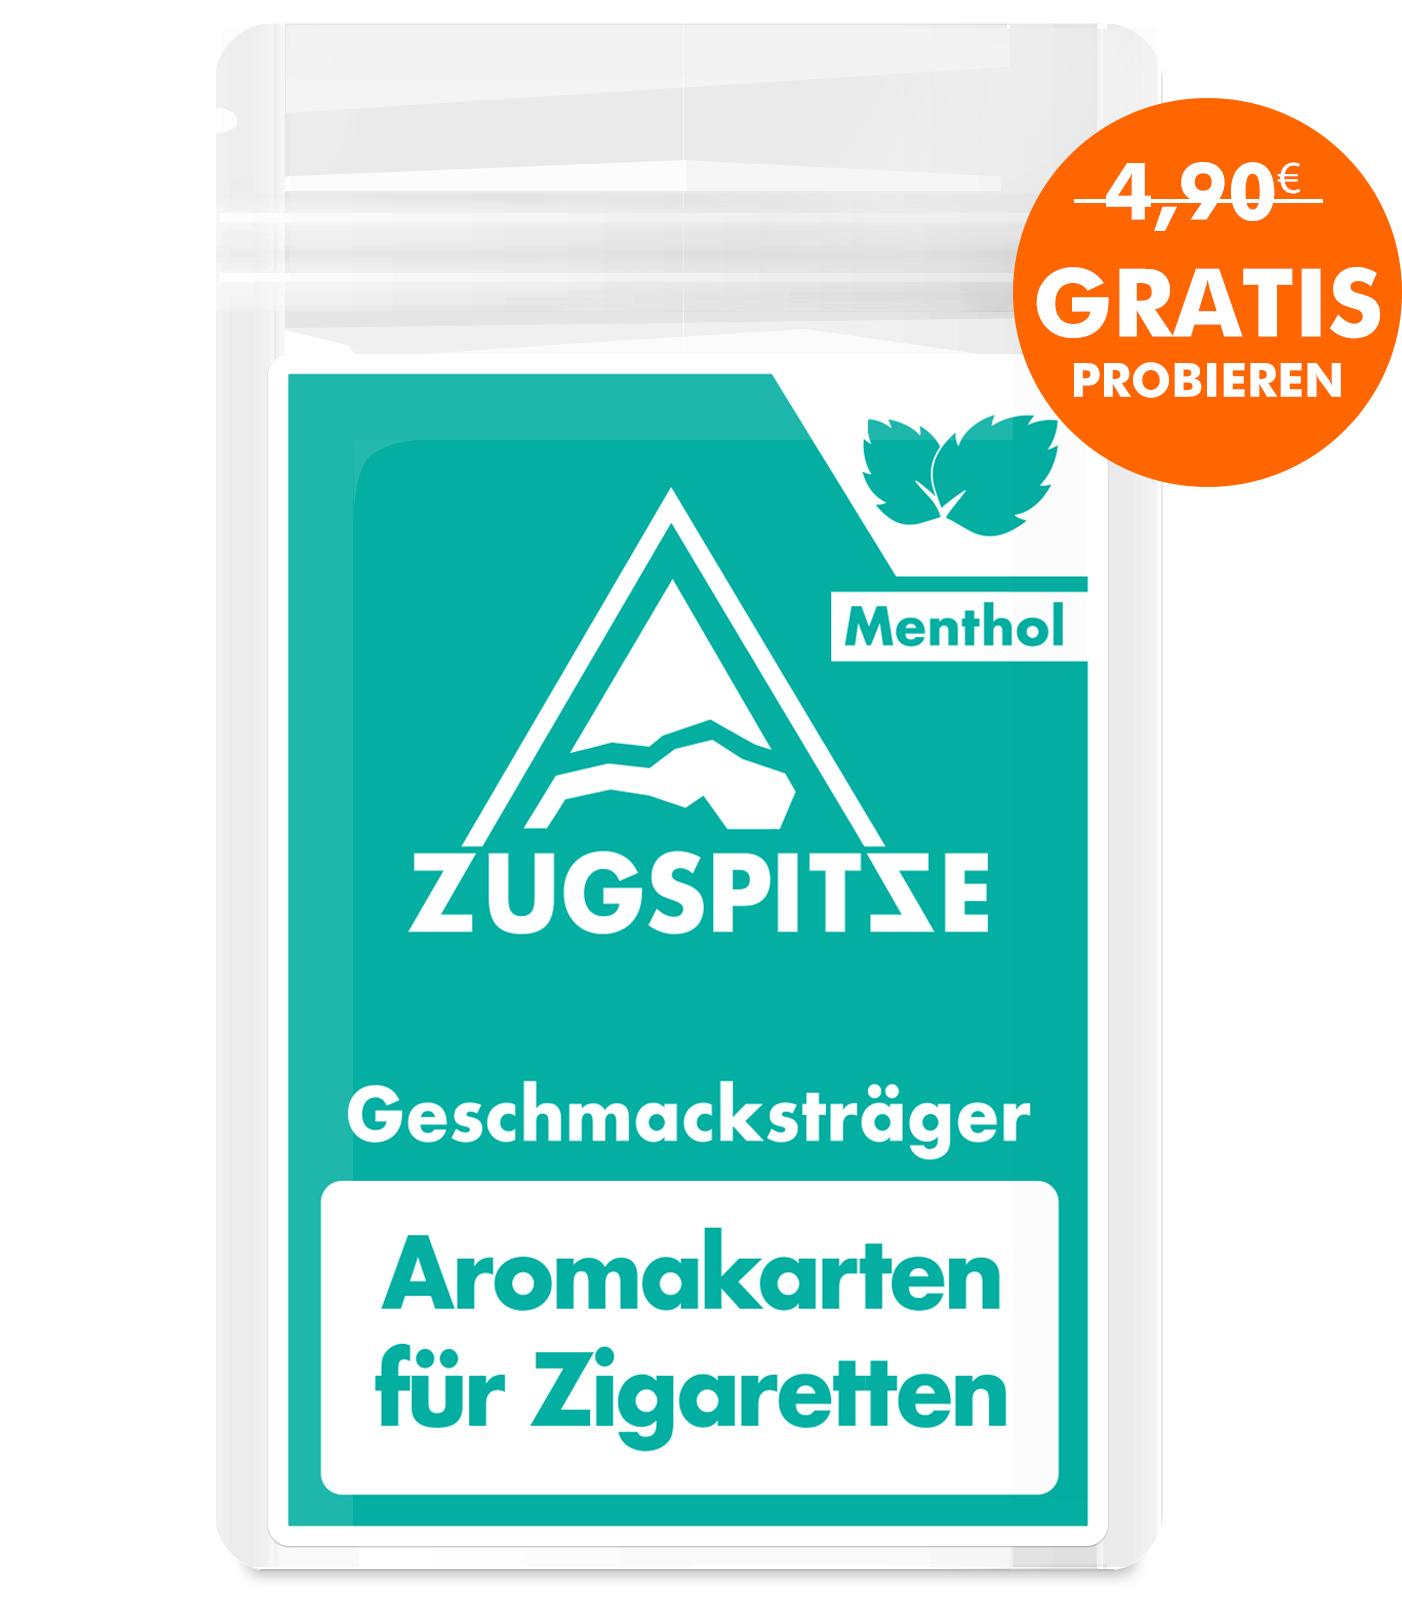 GRATIS Probepack